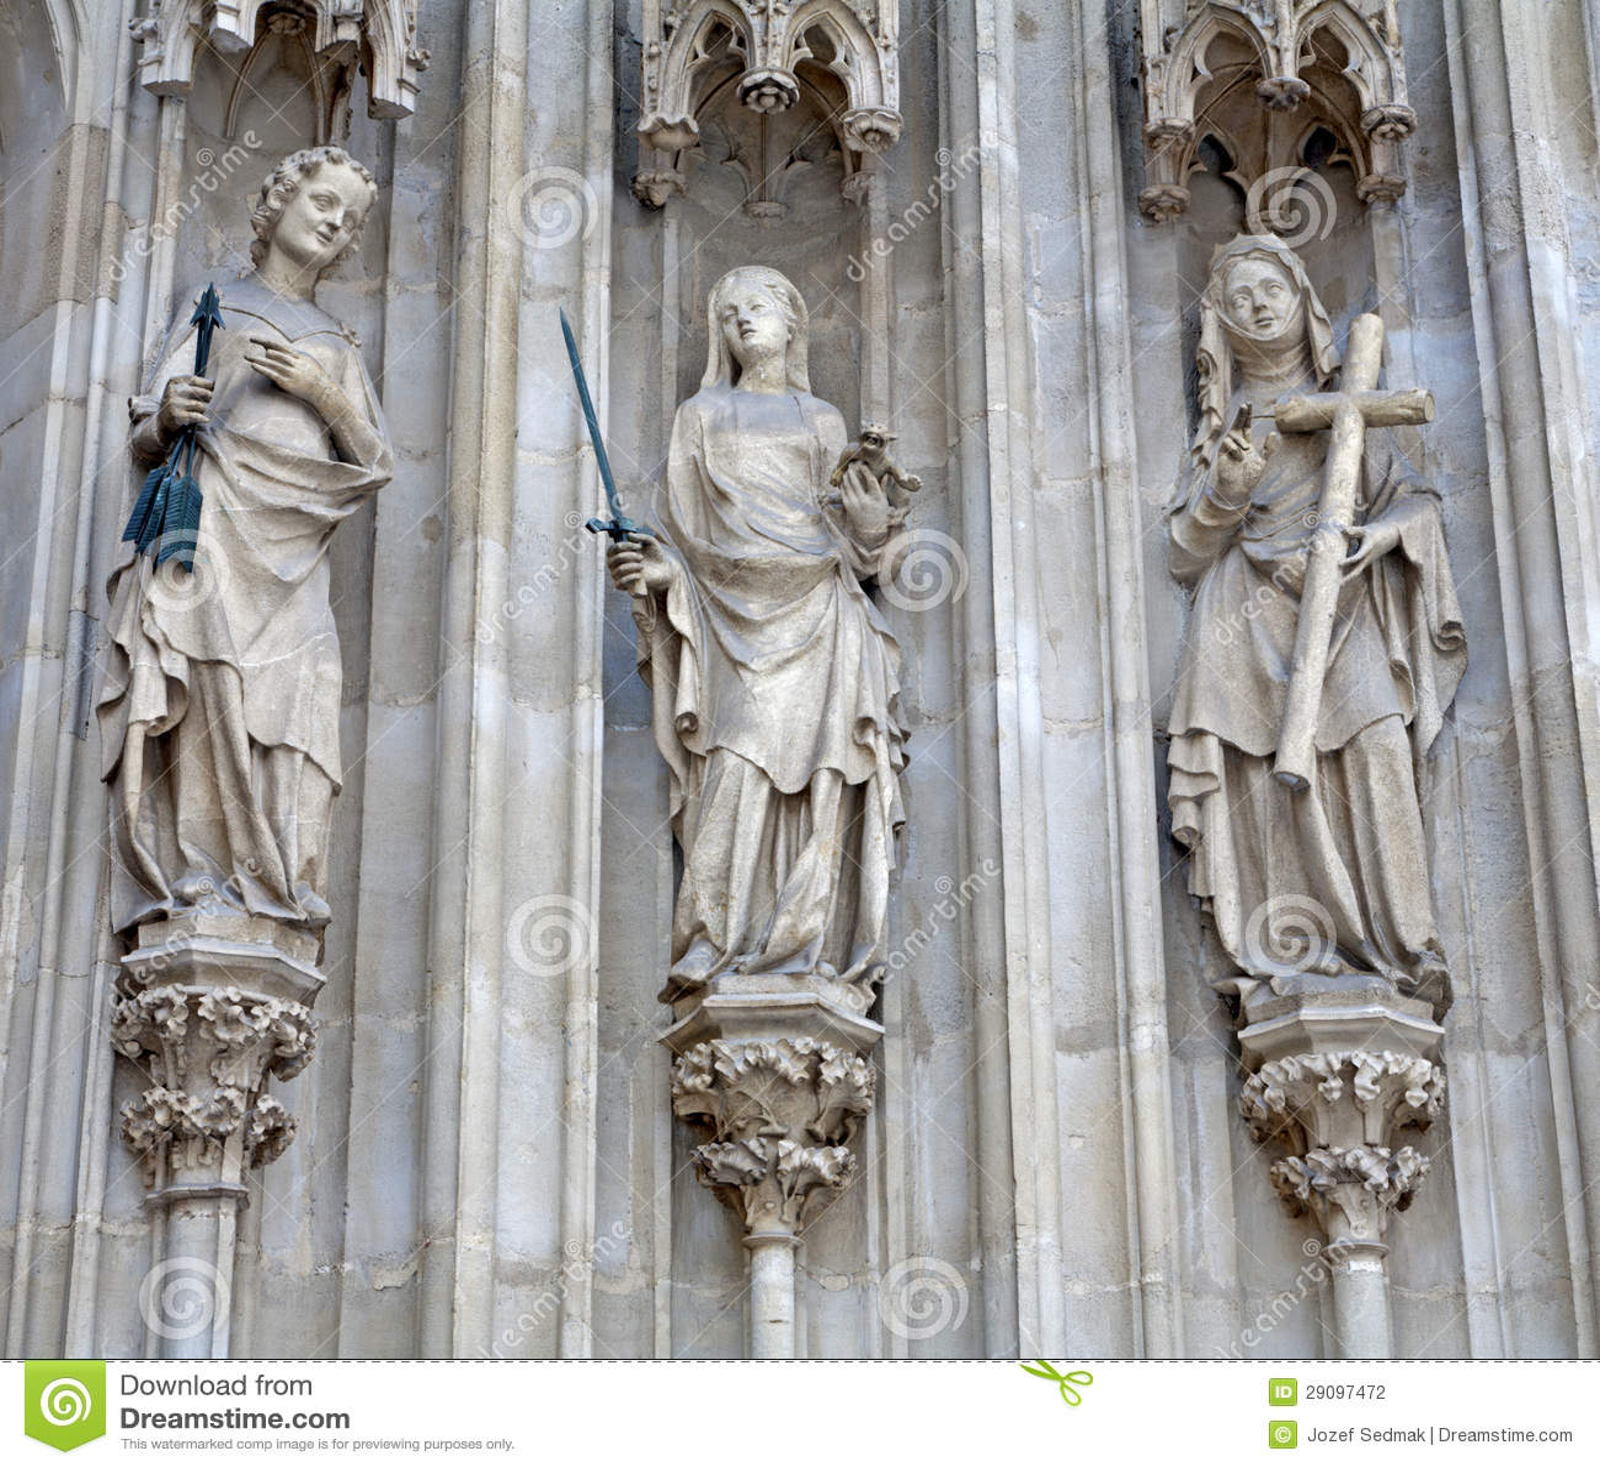 Viena - três virtudes cardinais do portal ocidental de Minoriten gótico